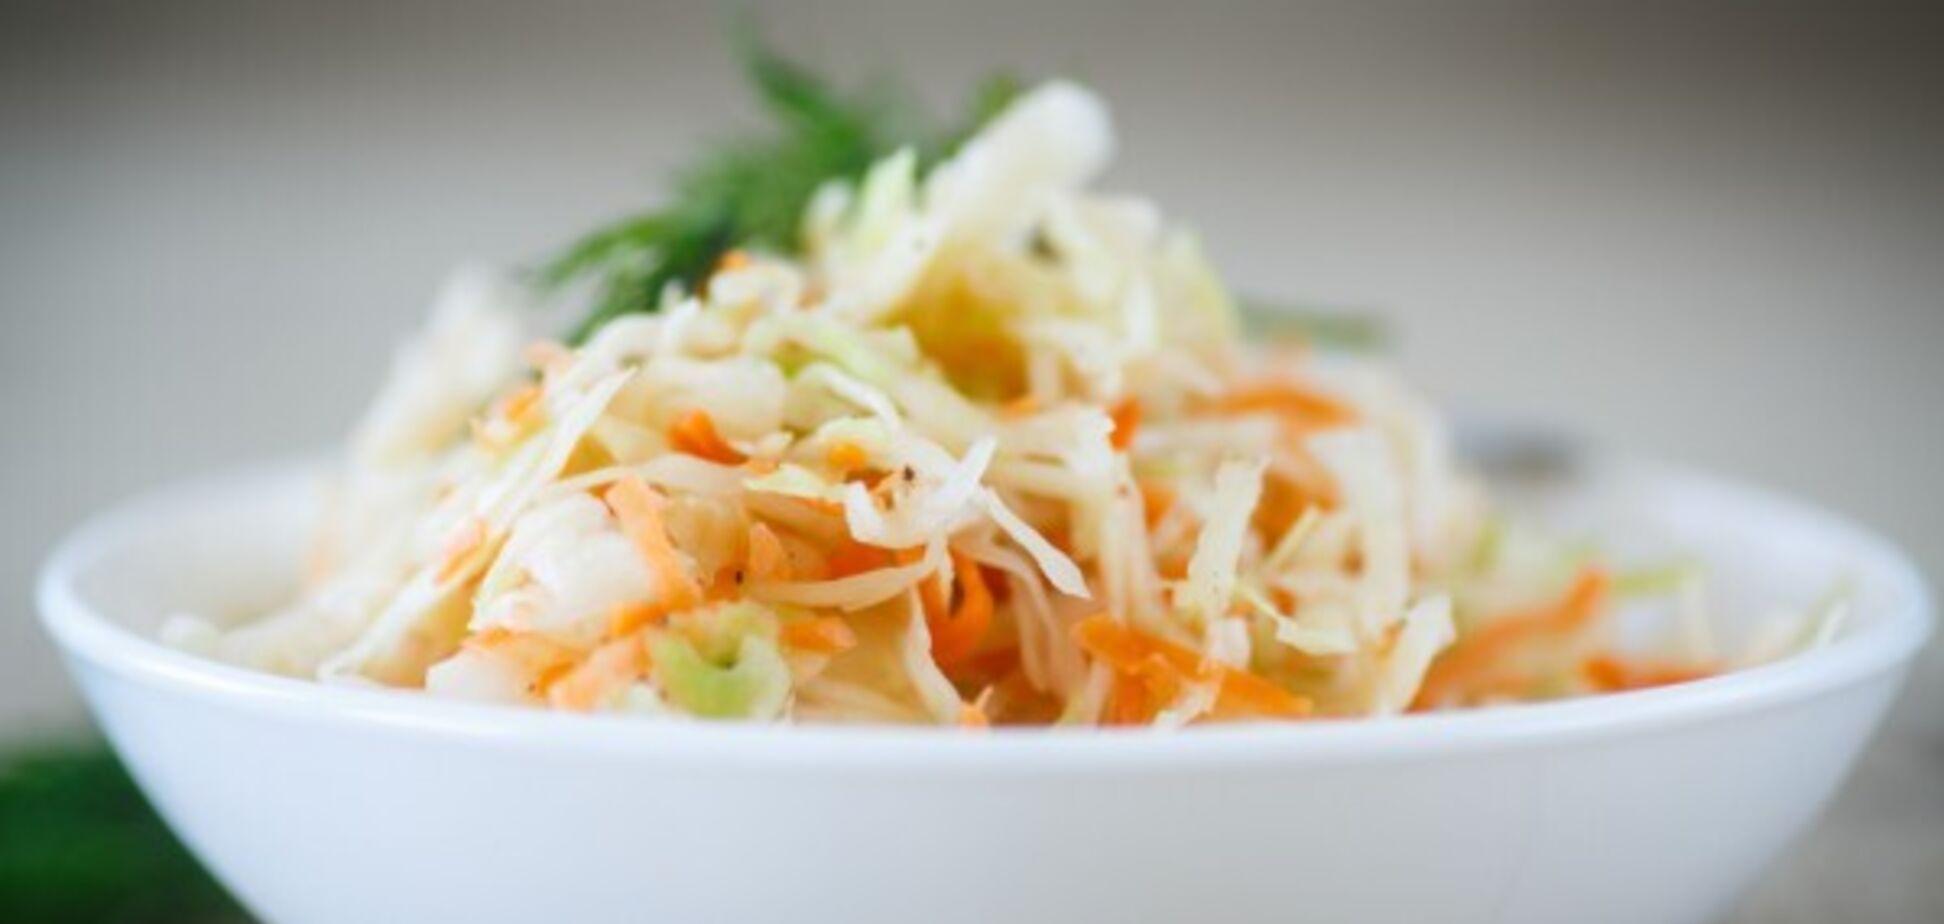 Новий рецепт смачної квашеної капусти на зиму